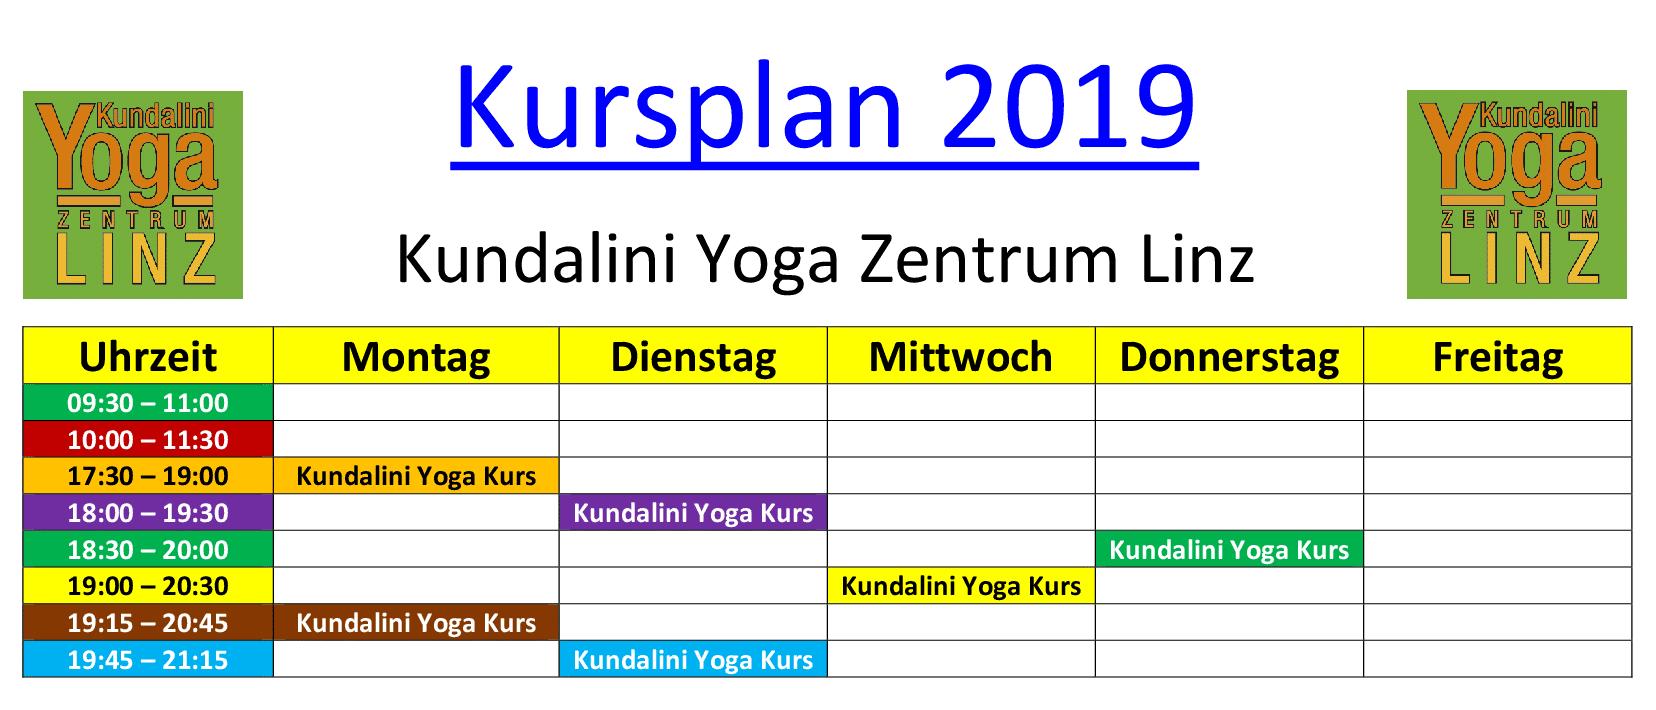 Kursplan 2019 Webseite